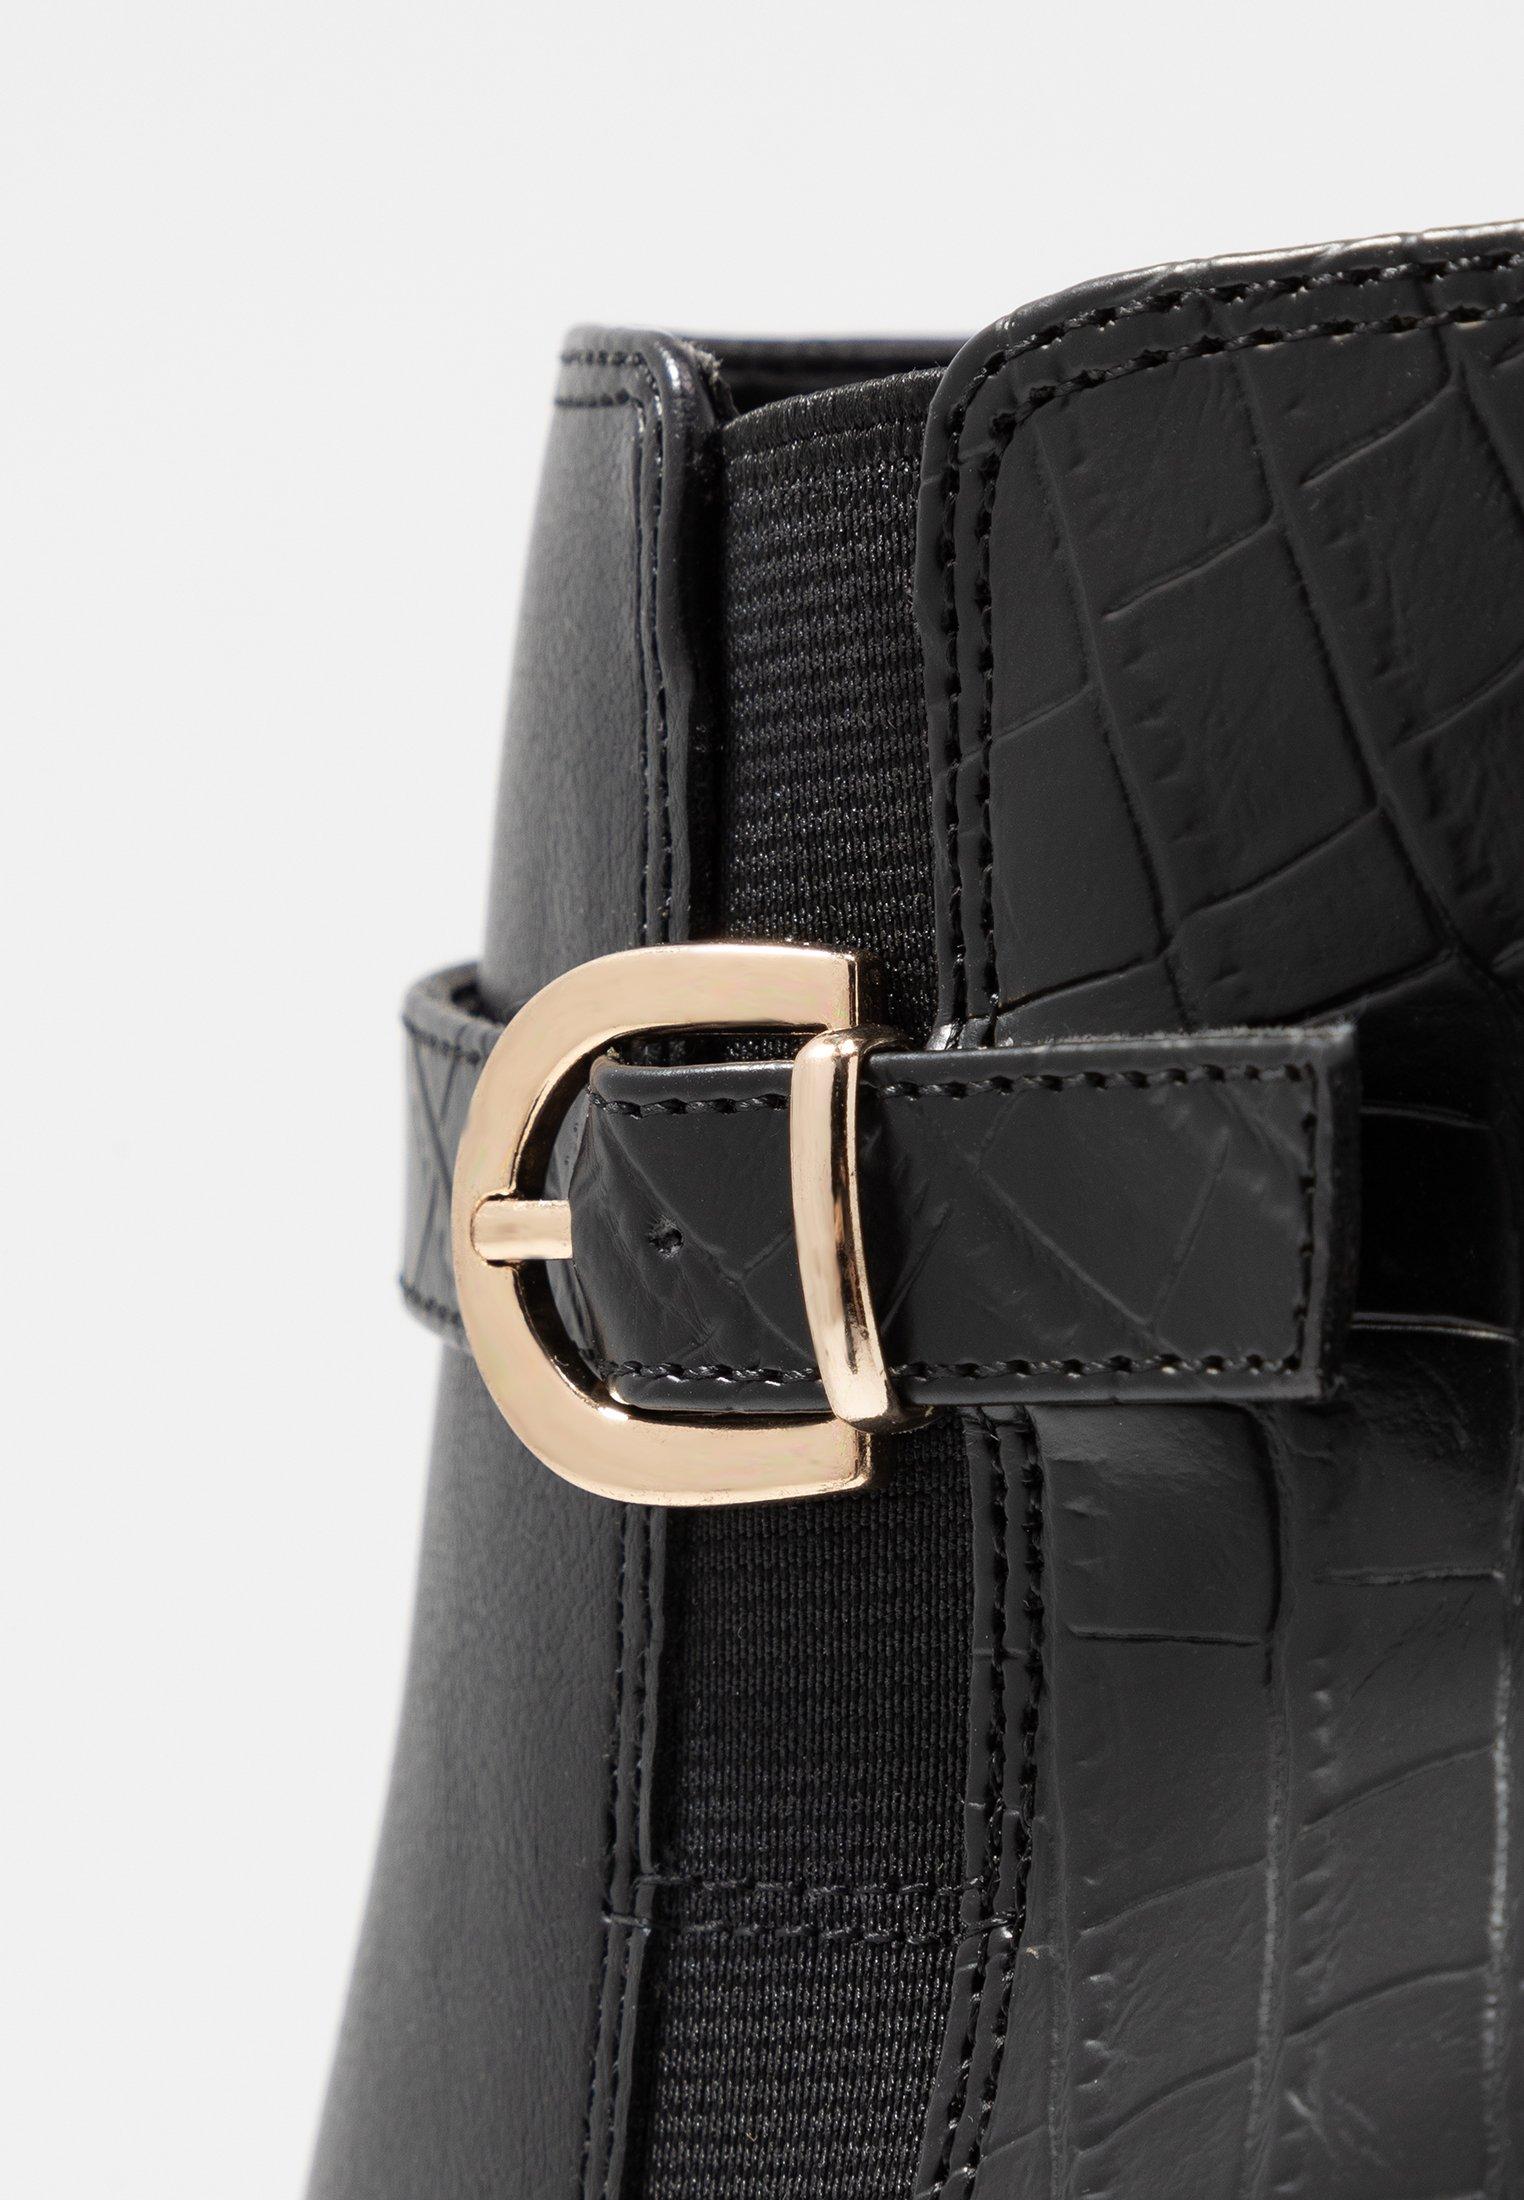 New Look ANTHONY - Bottines à talons hauts black